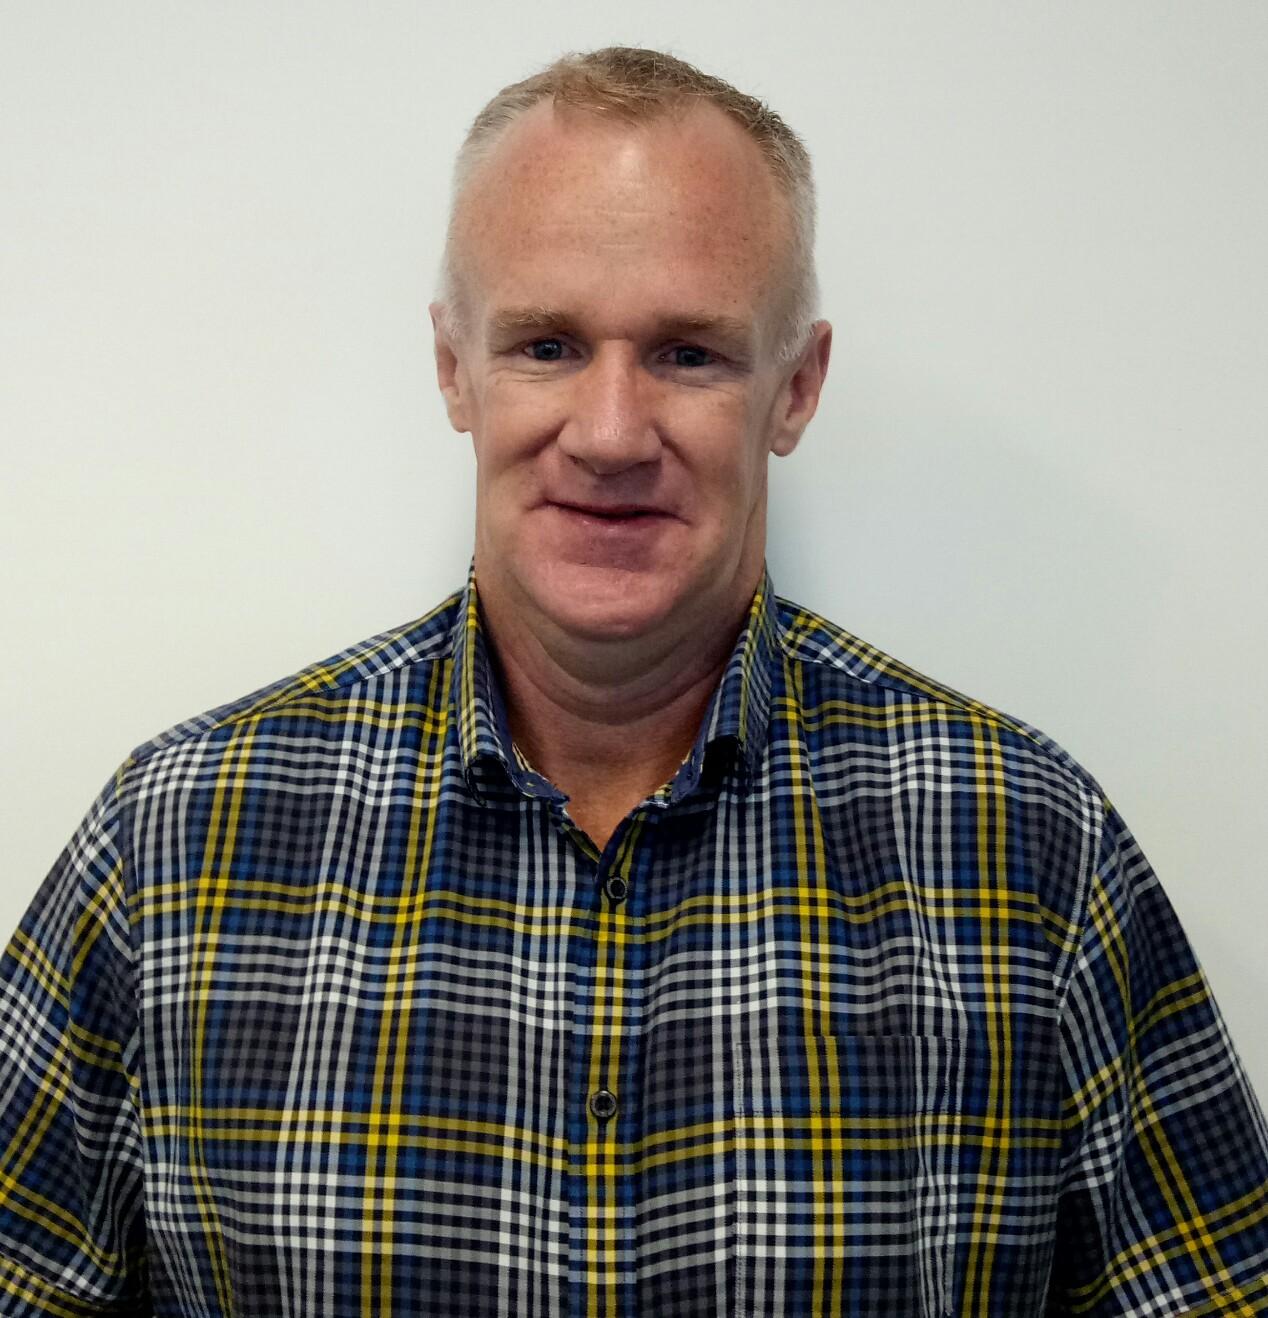 20190213 Stephen Barber - Profile Photo